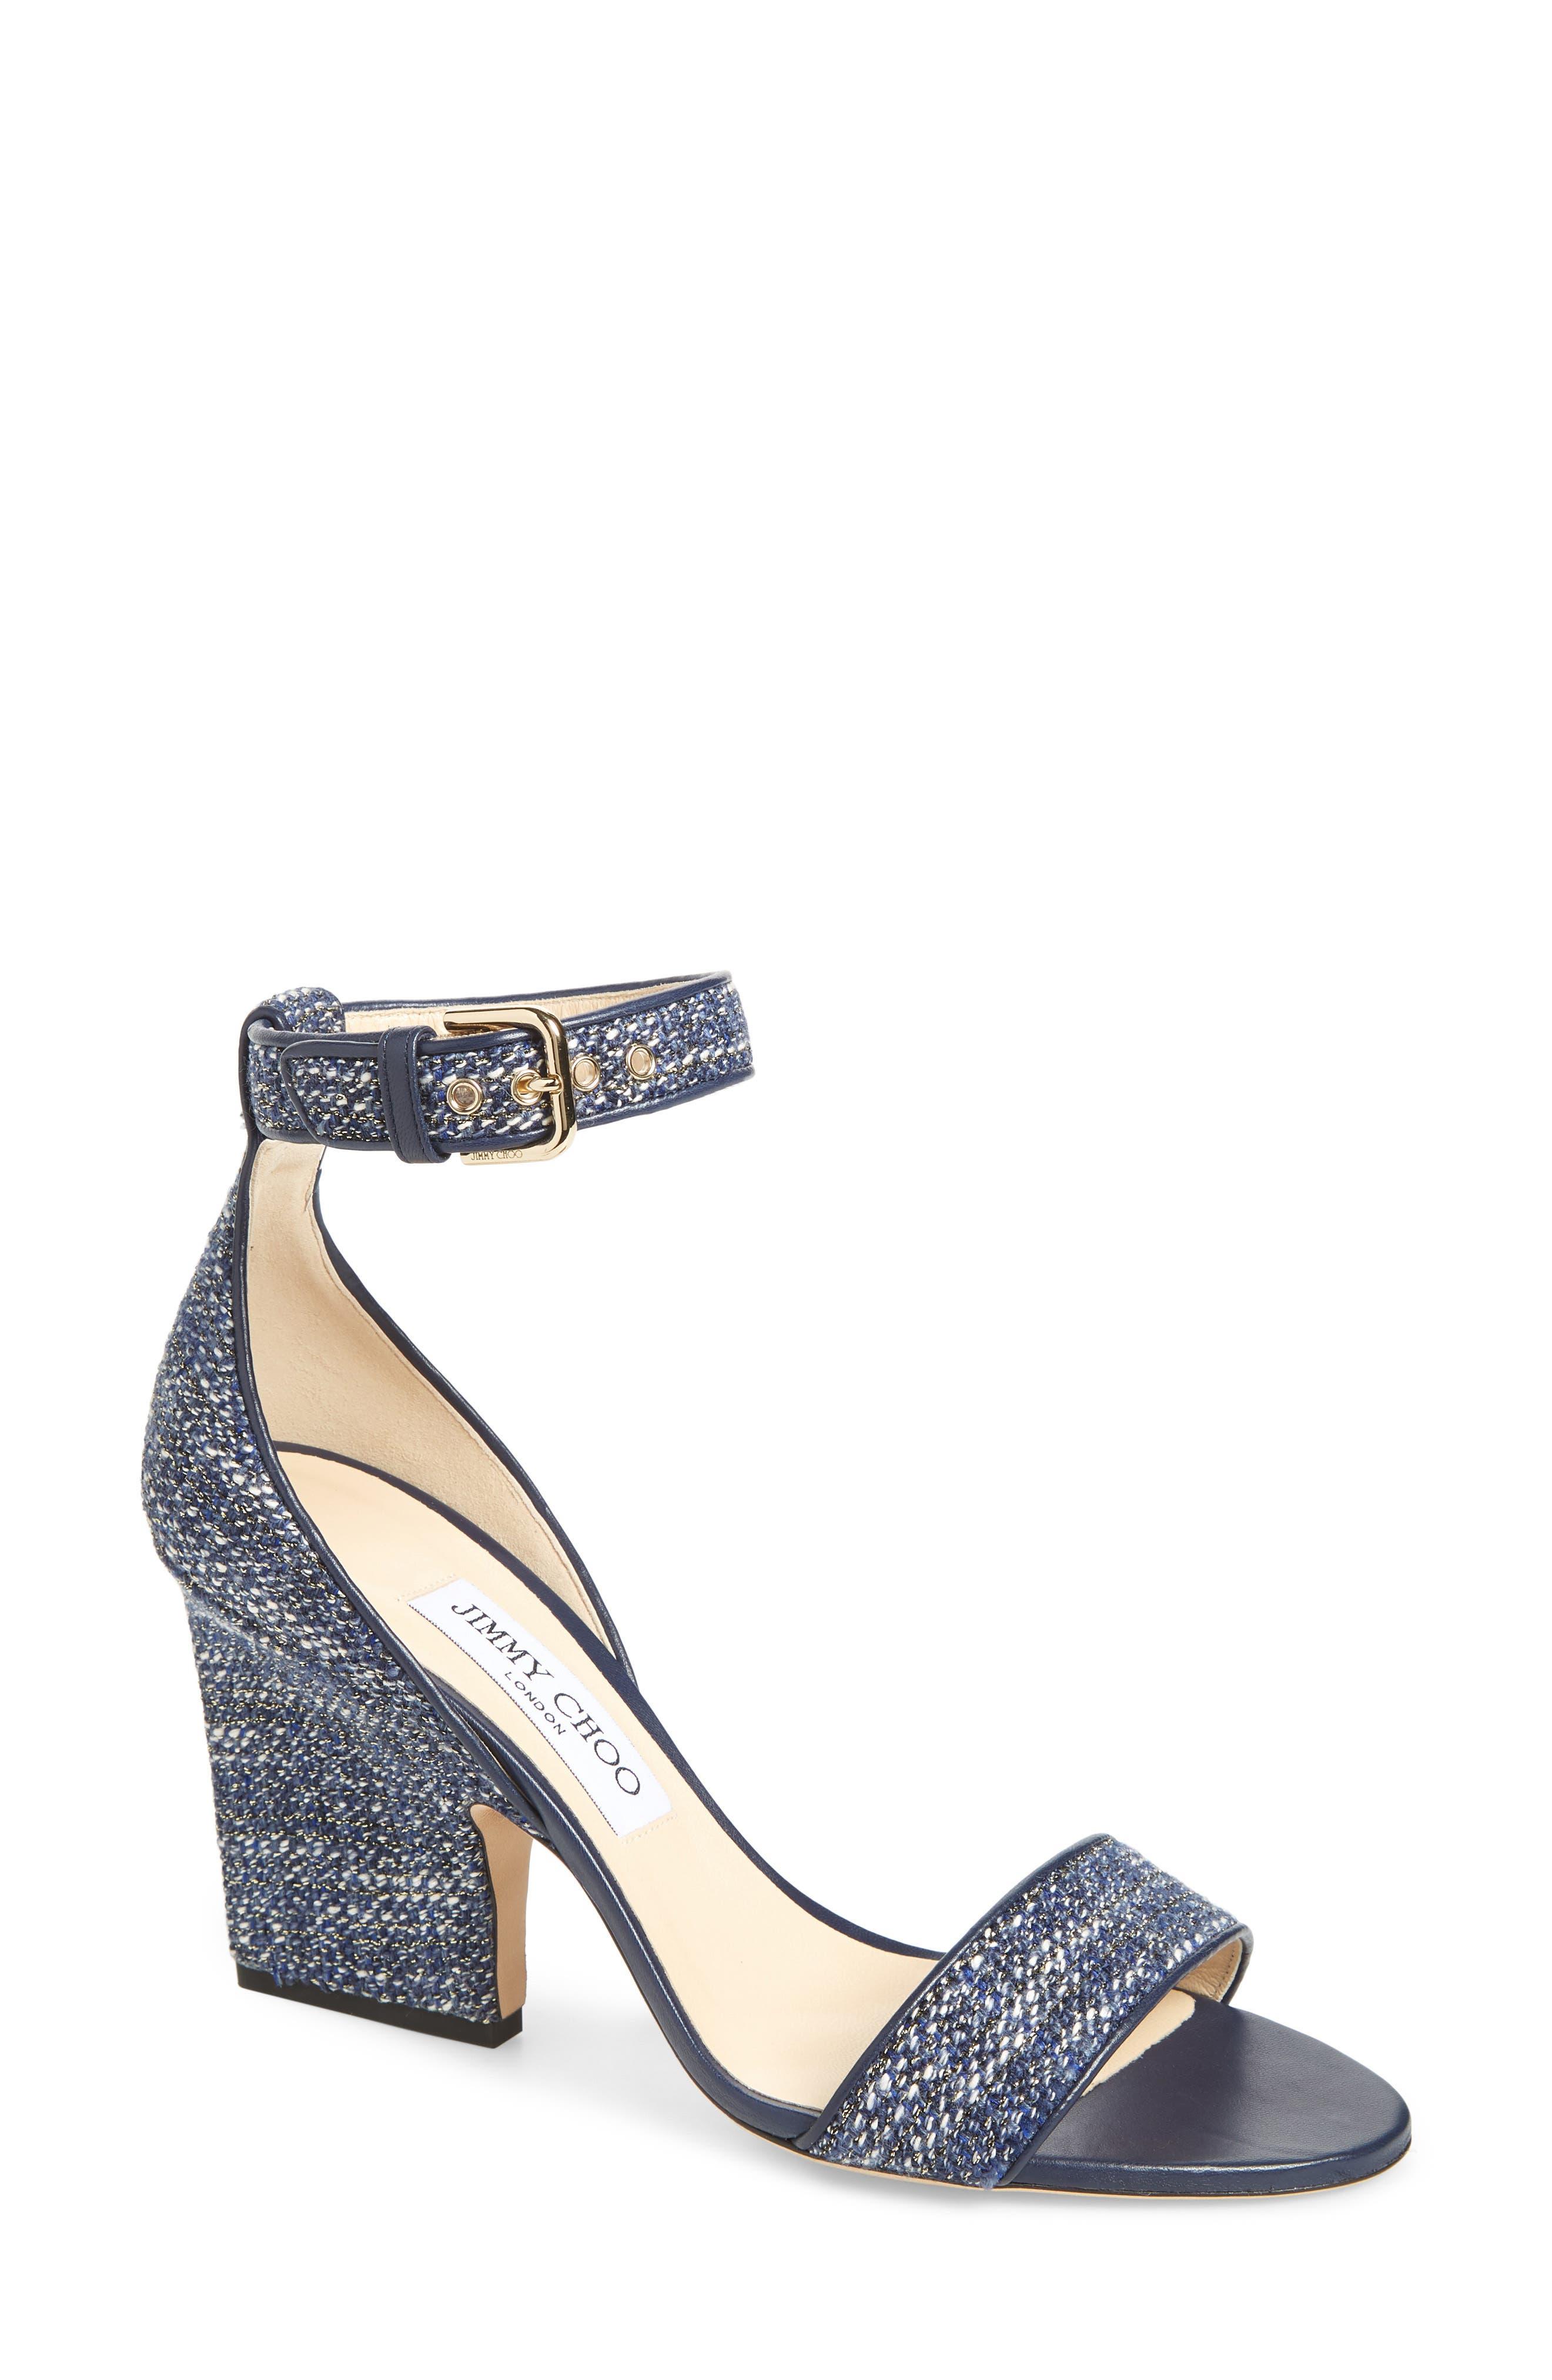 Edina Ankle Strap Sandal,                         Main,                         color, NAVY GLITTER